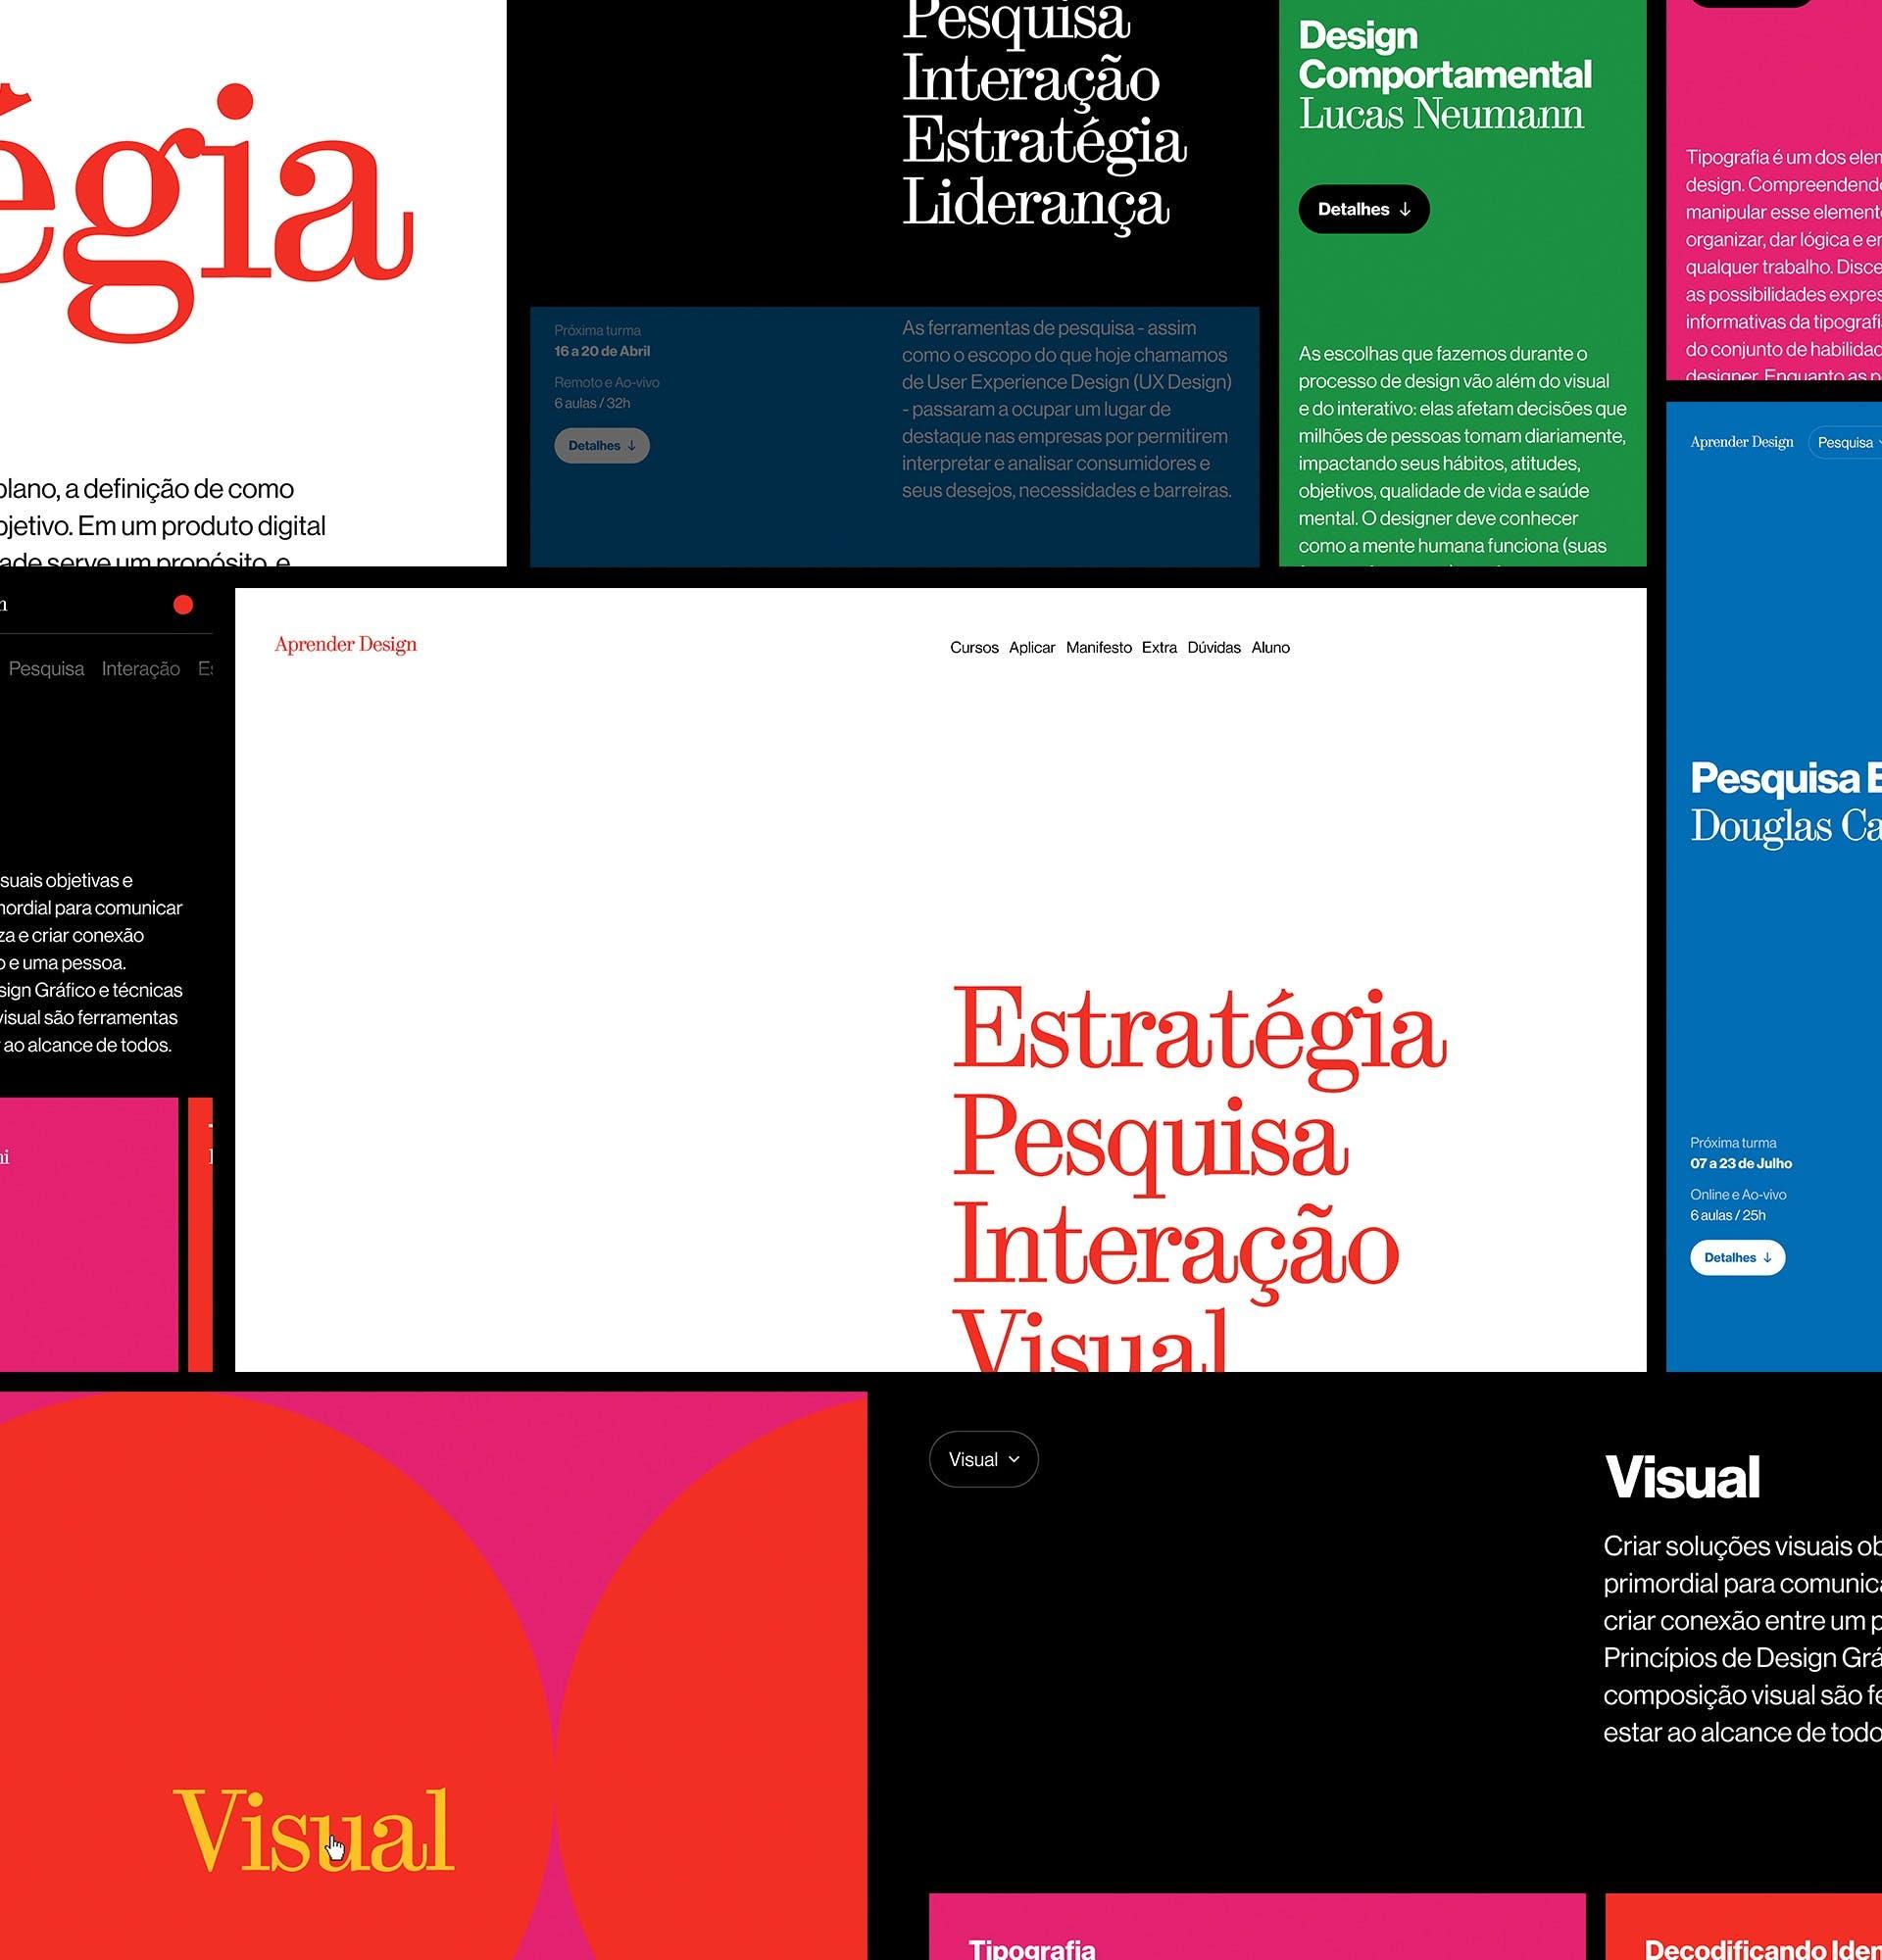 glauber-sampaio-aprender-design-13.jpeg